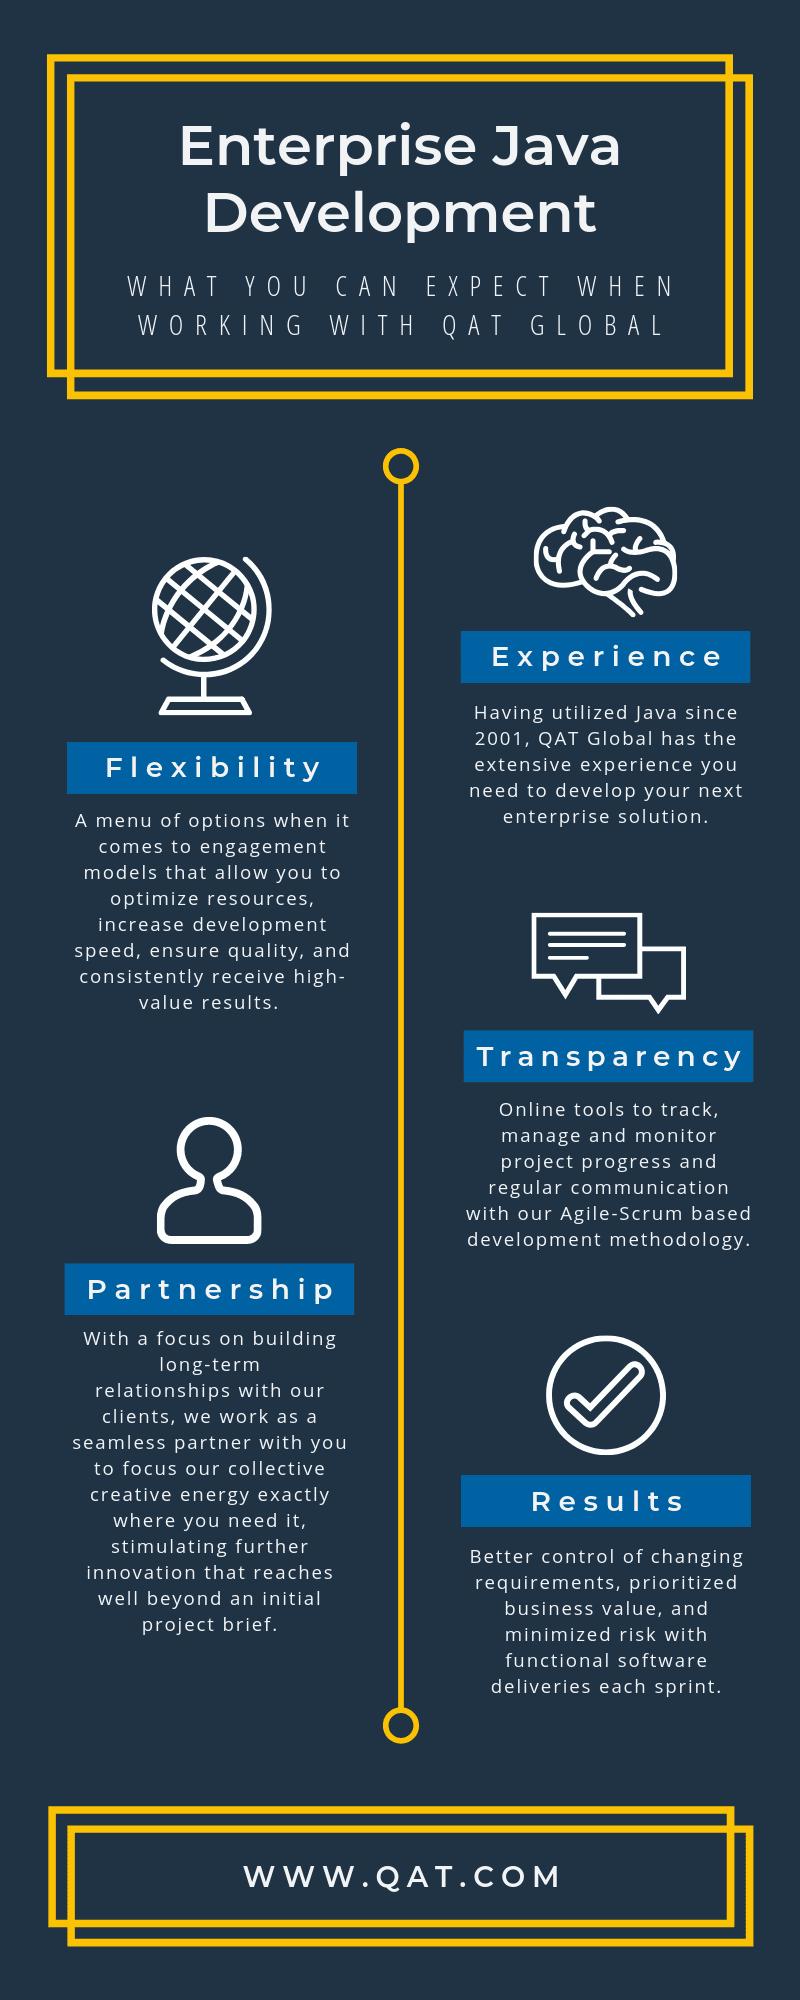 Enterprise Java Development - QAT Global